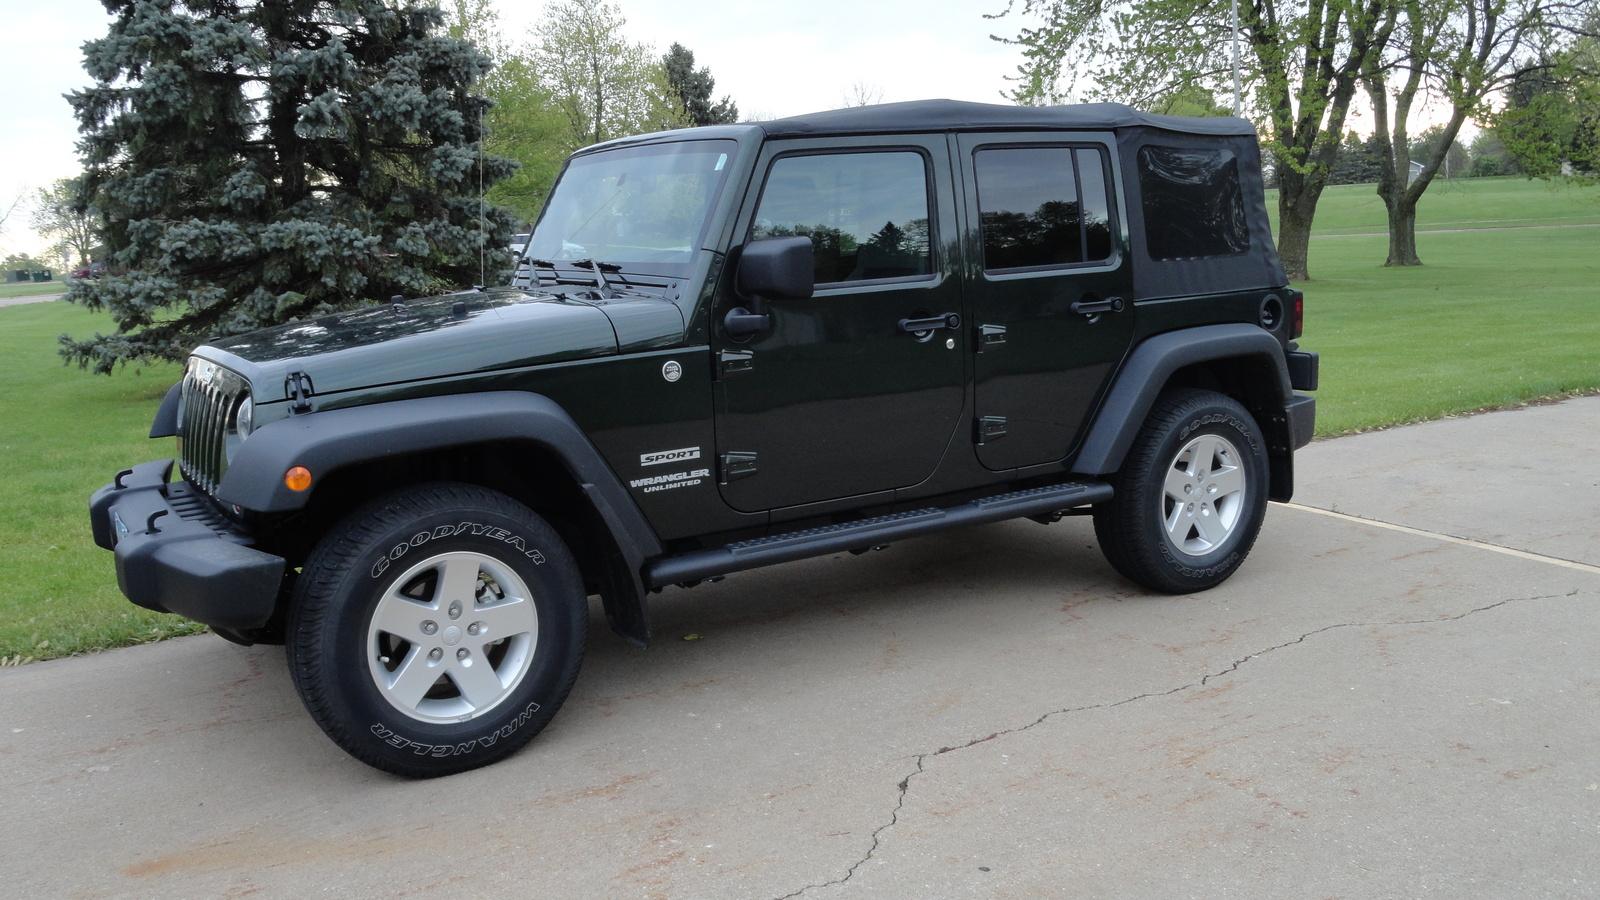 2010 jeep wrangler exterior pictures cargurus. Black Bedroom Furniture Sets. Home Design Ideas